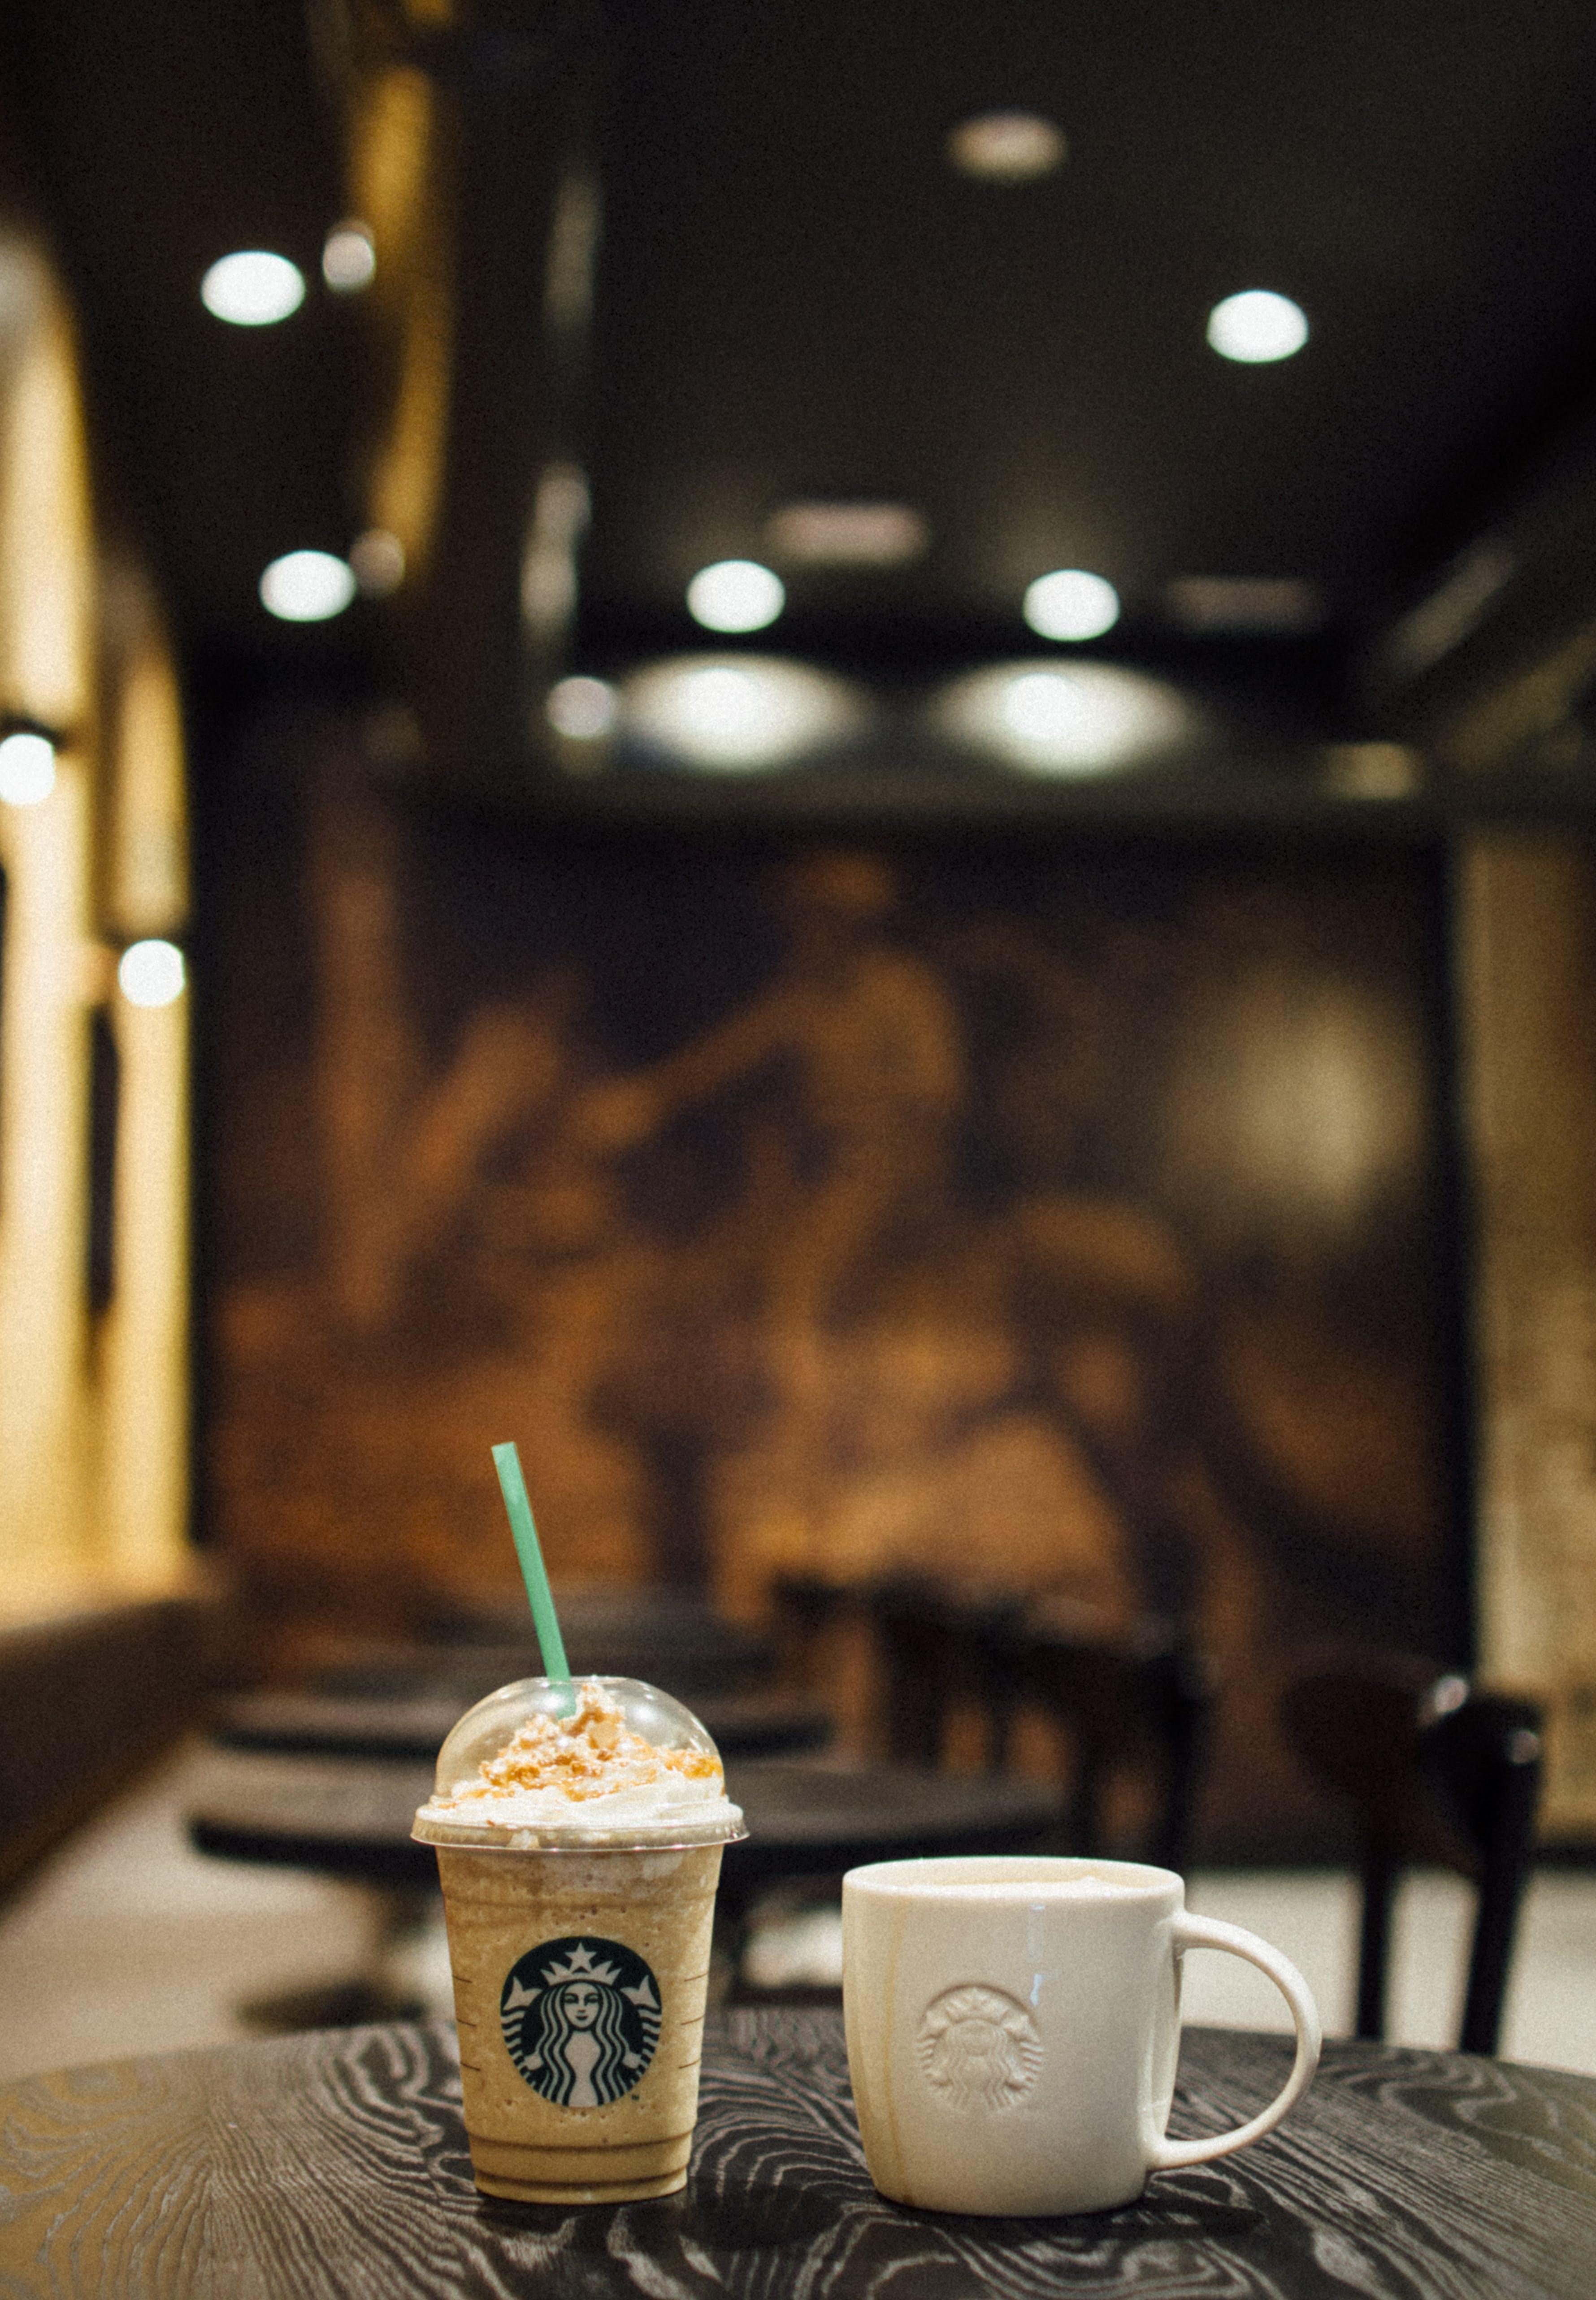 Photo of Starbucks Cup